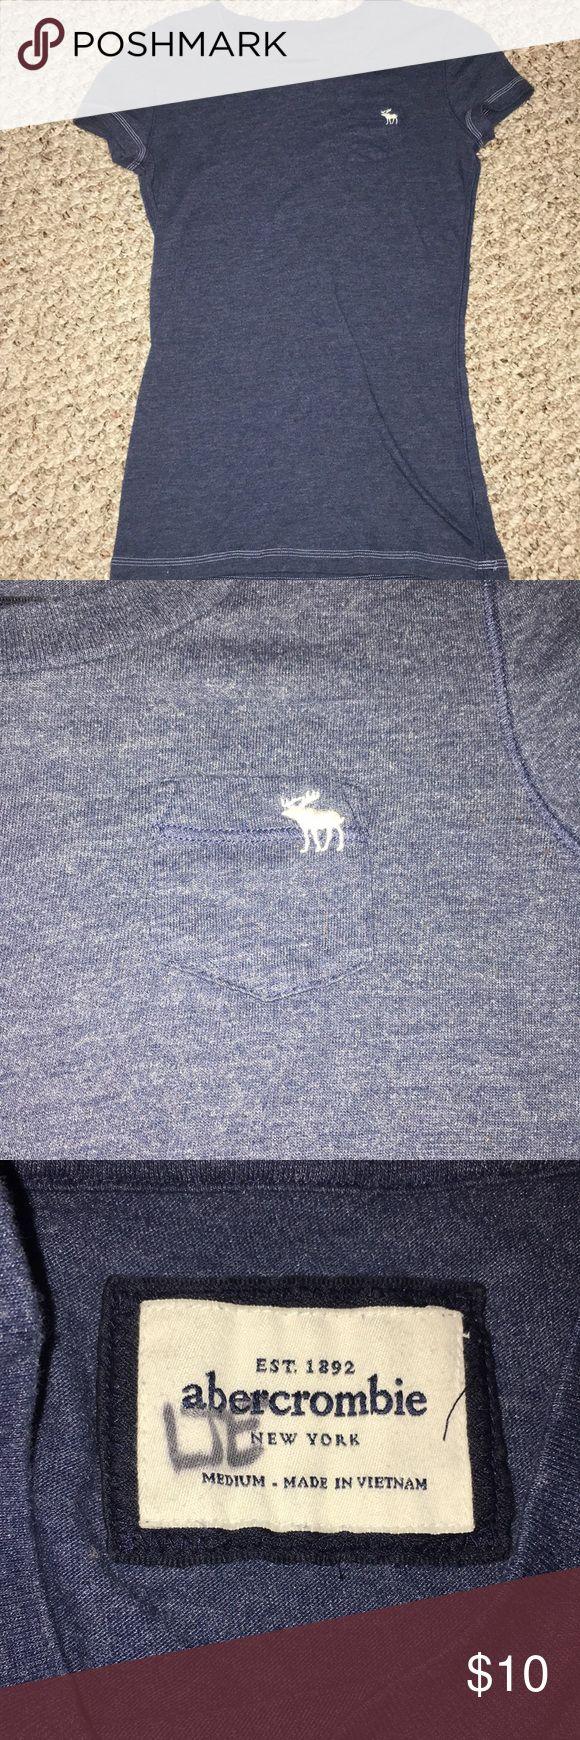 Short sleeve  Abercrombie t-shirt Cute blue Abercrombie t-shirt Abercombie Kids Tops Tees - Short Sleeve